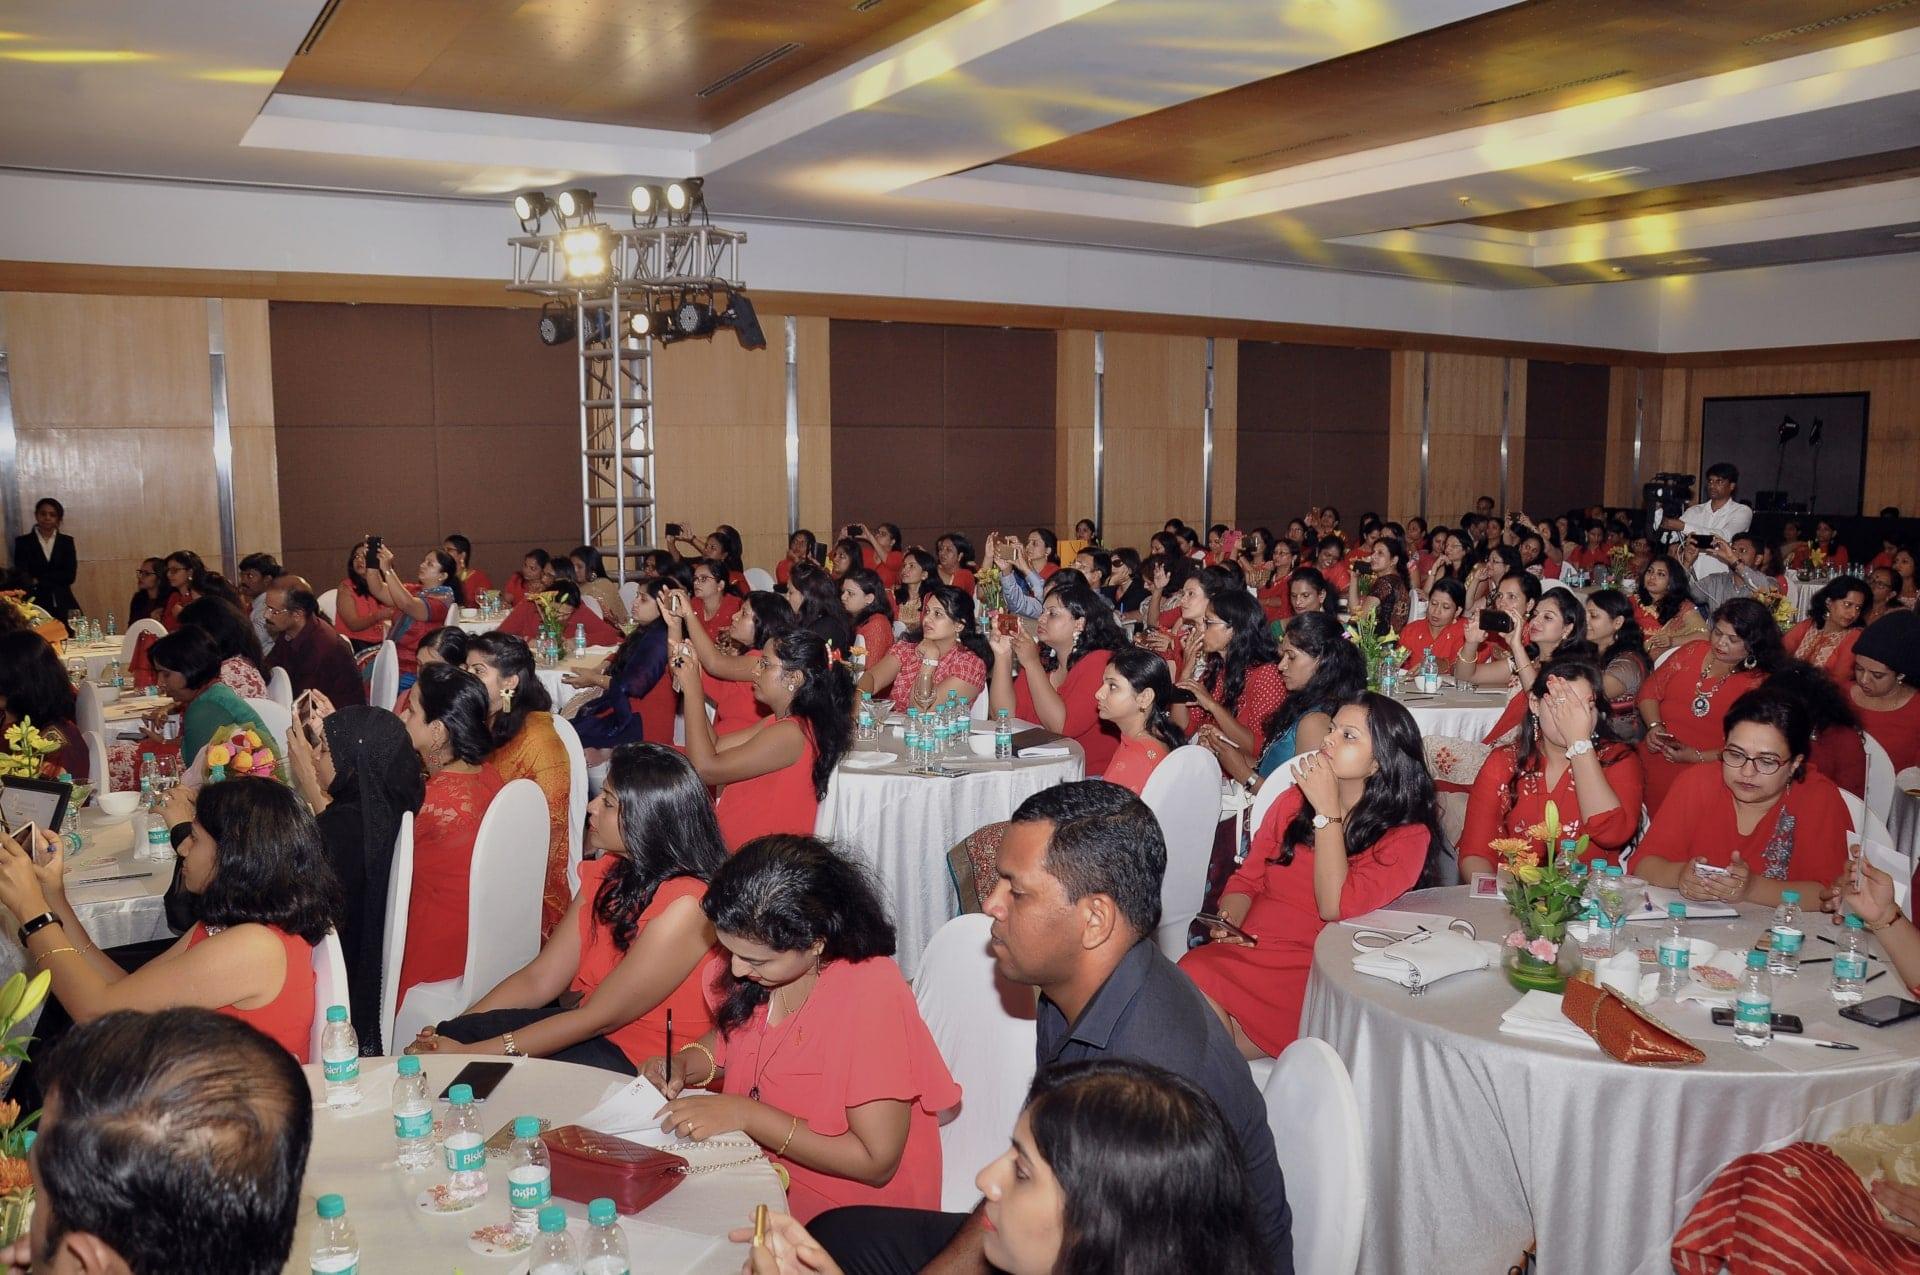 Amway Skincare Event Bangalore